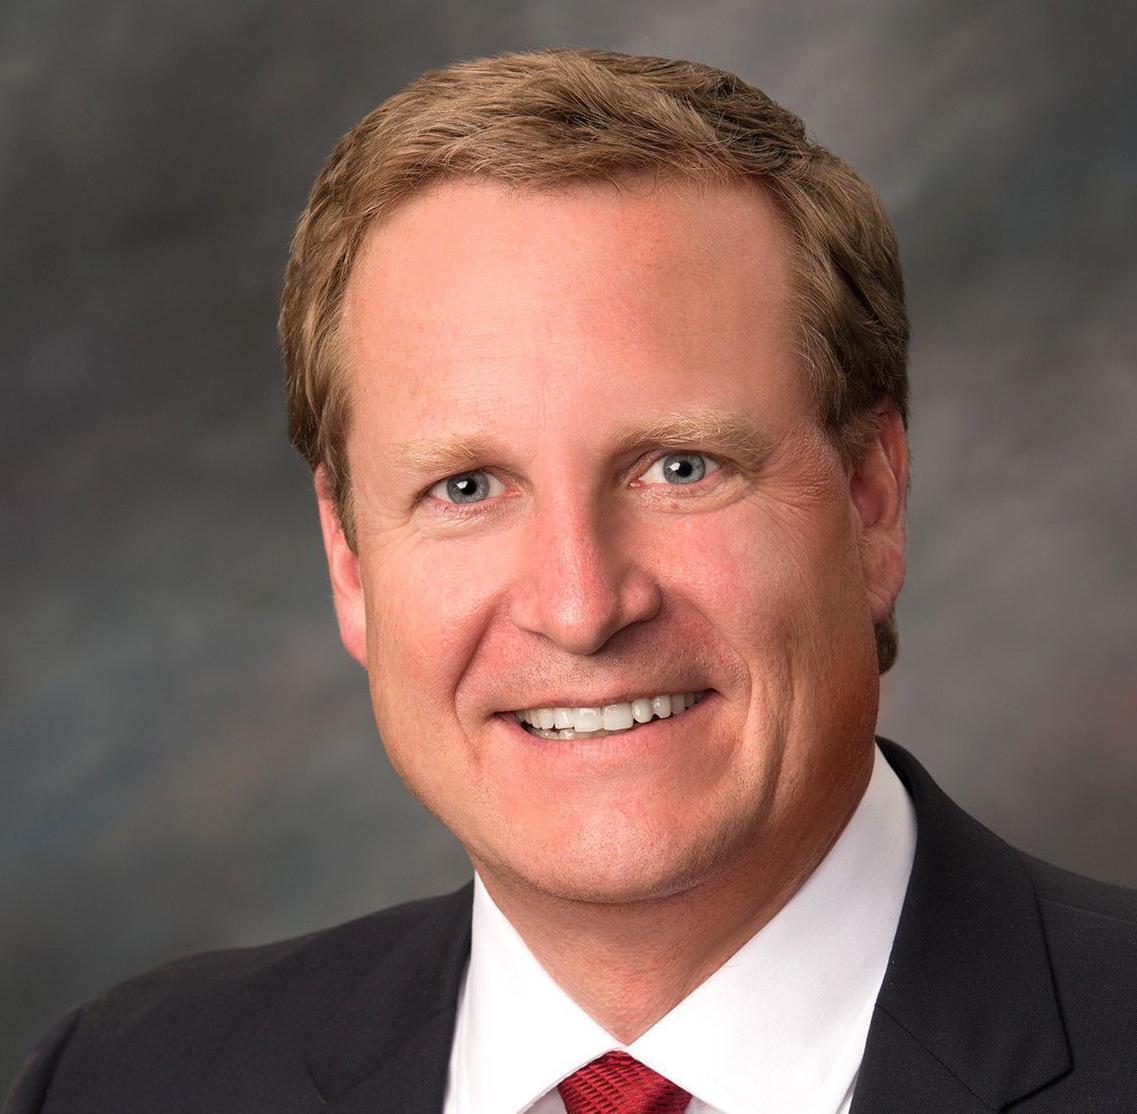 Kurt Alme, U.S. attorney